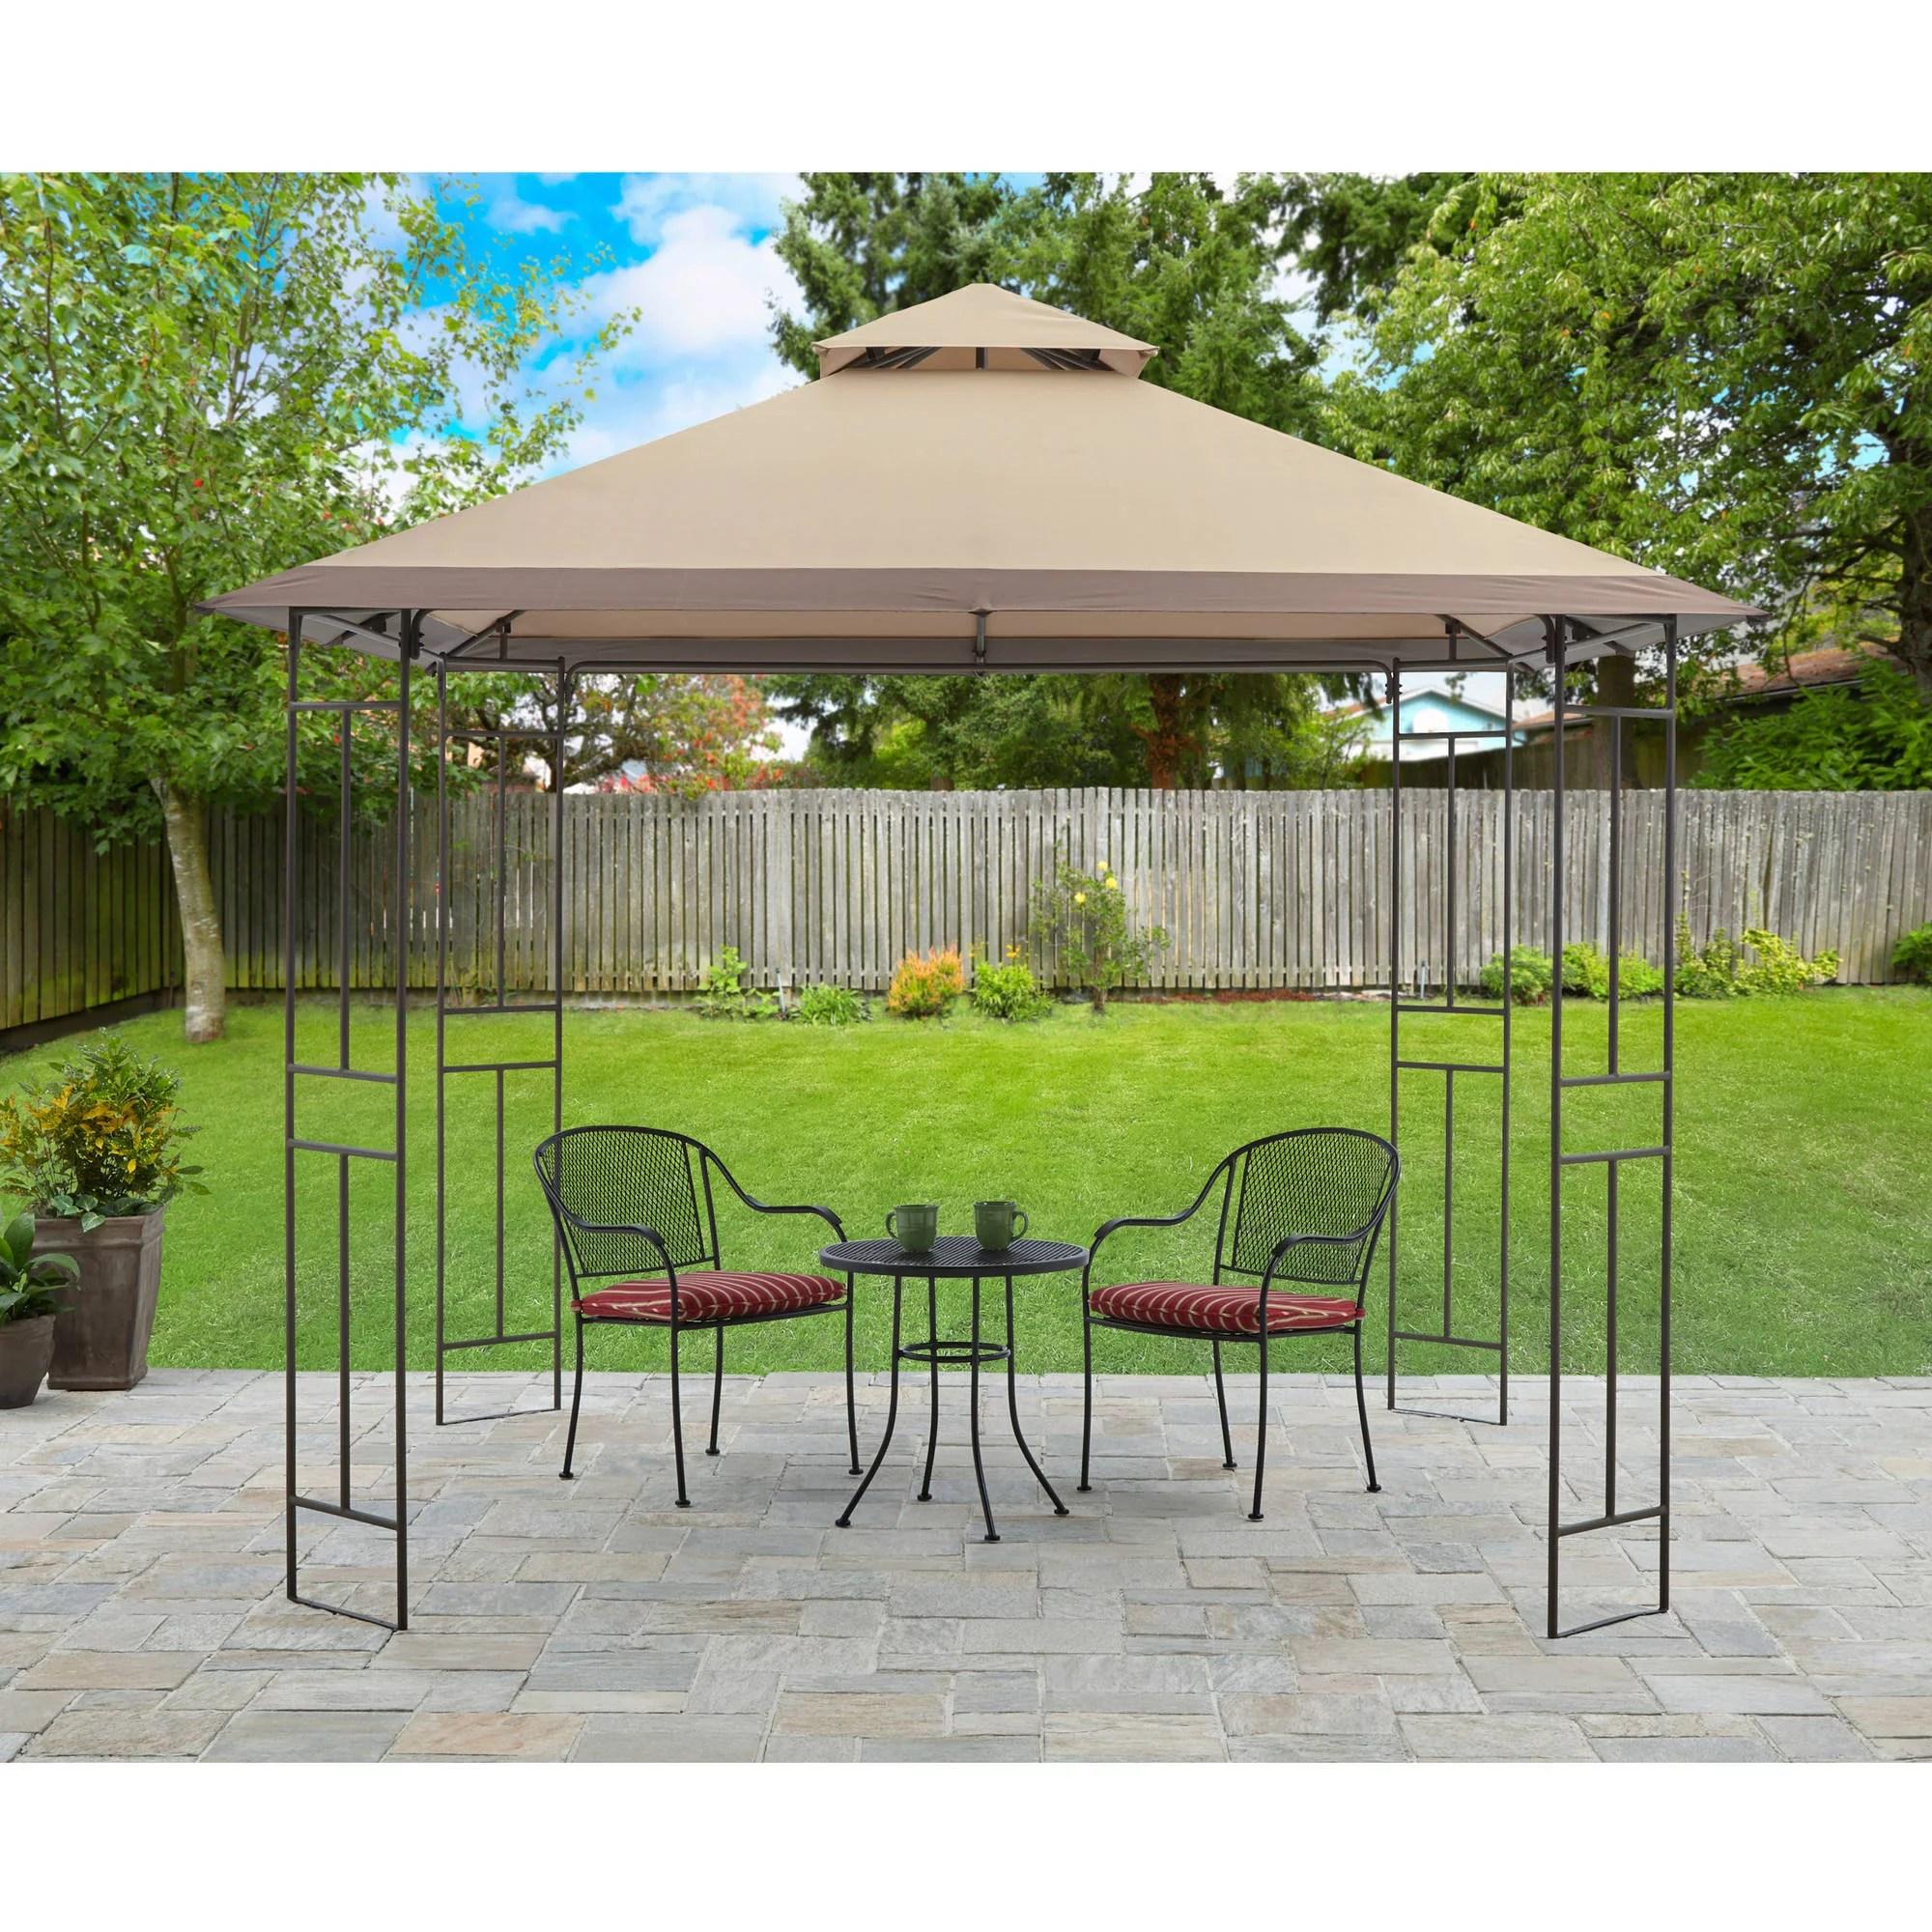 mainstays toni 10 x 10 outdoor patio gazebo walmart com